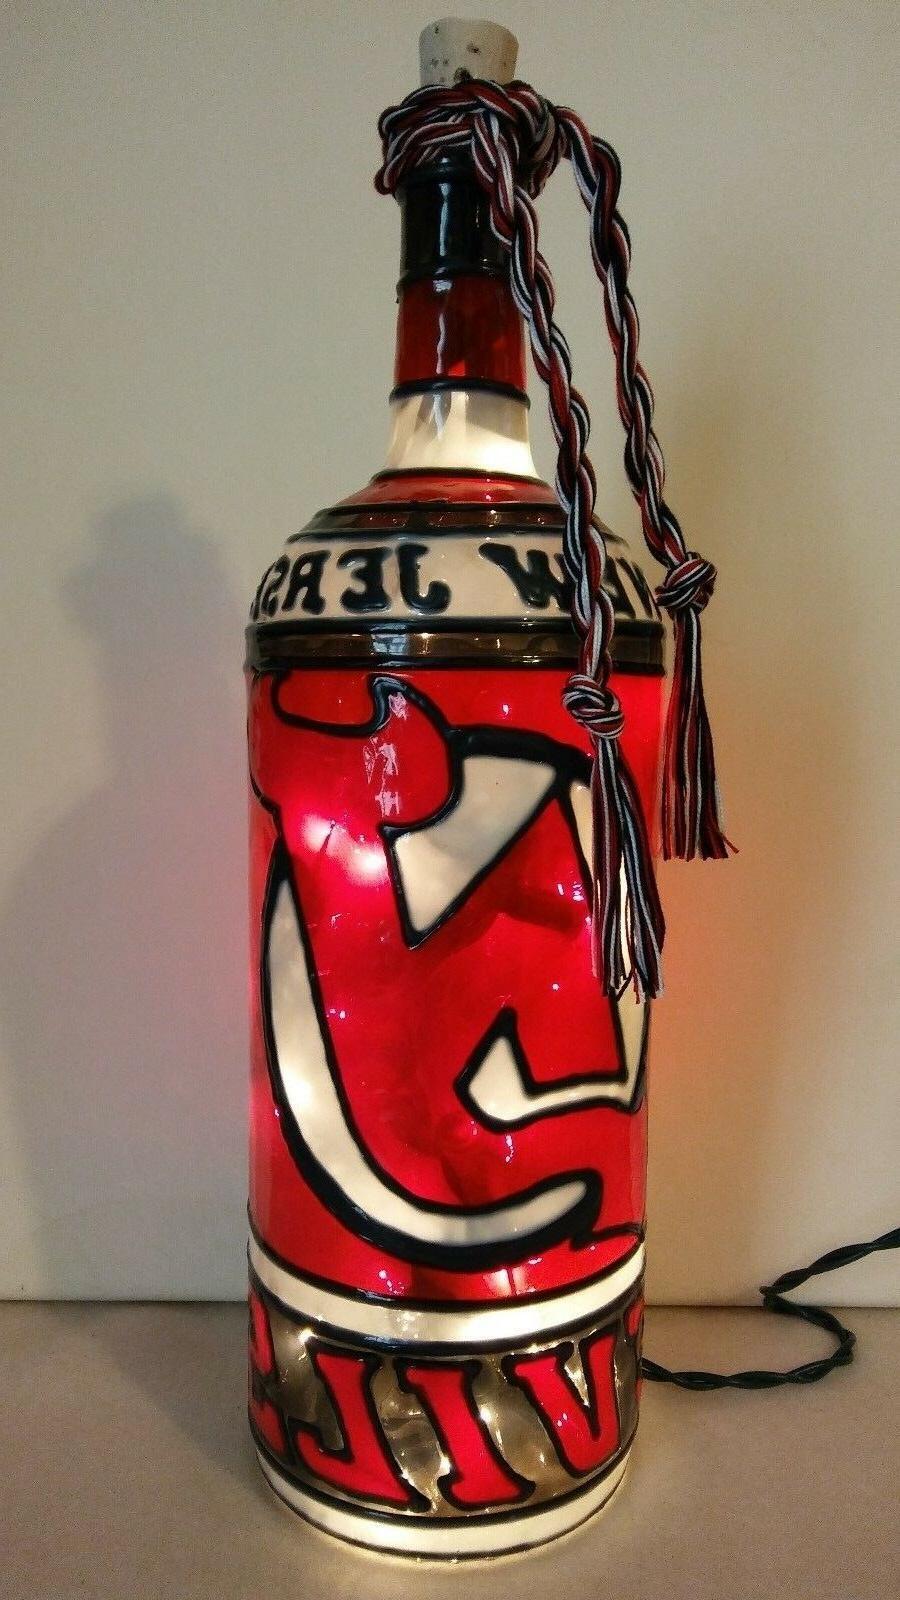 new jersey devils inspiered bottle lamp hand